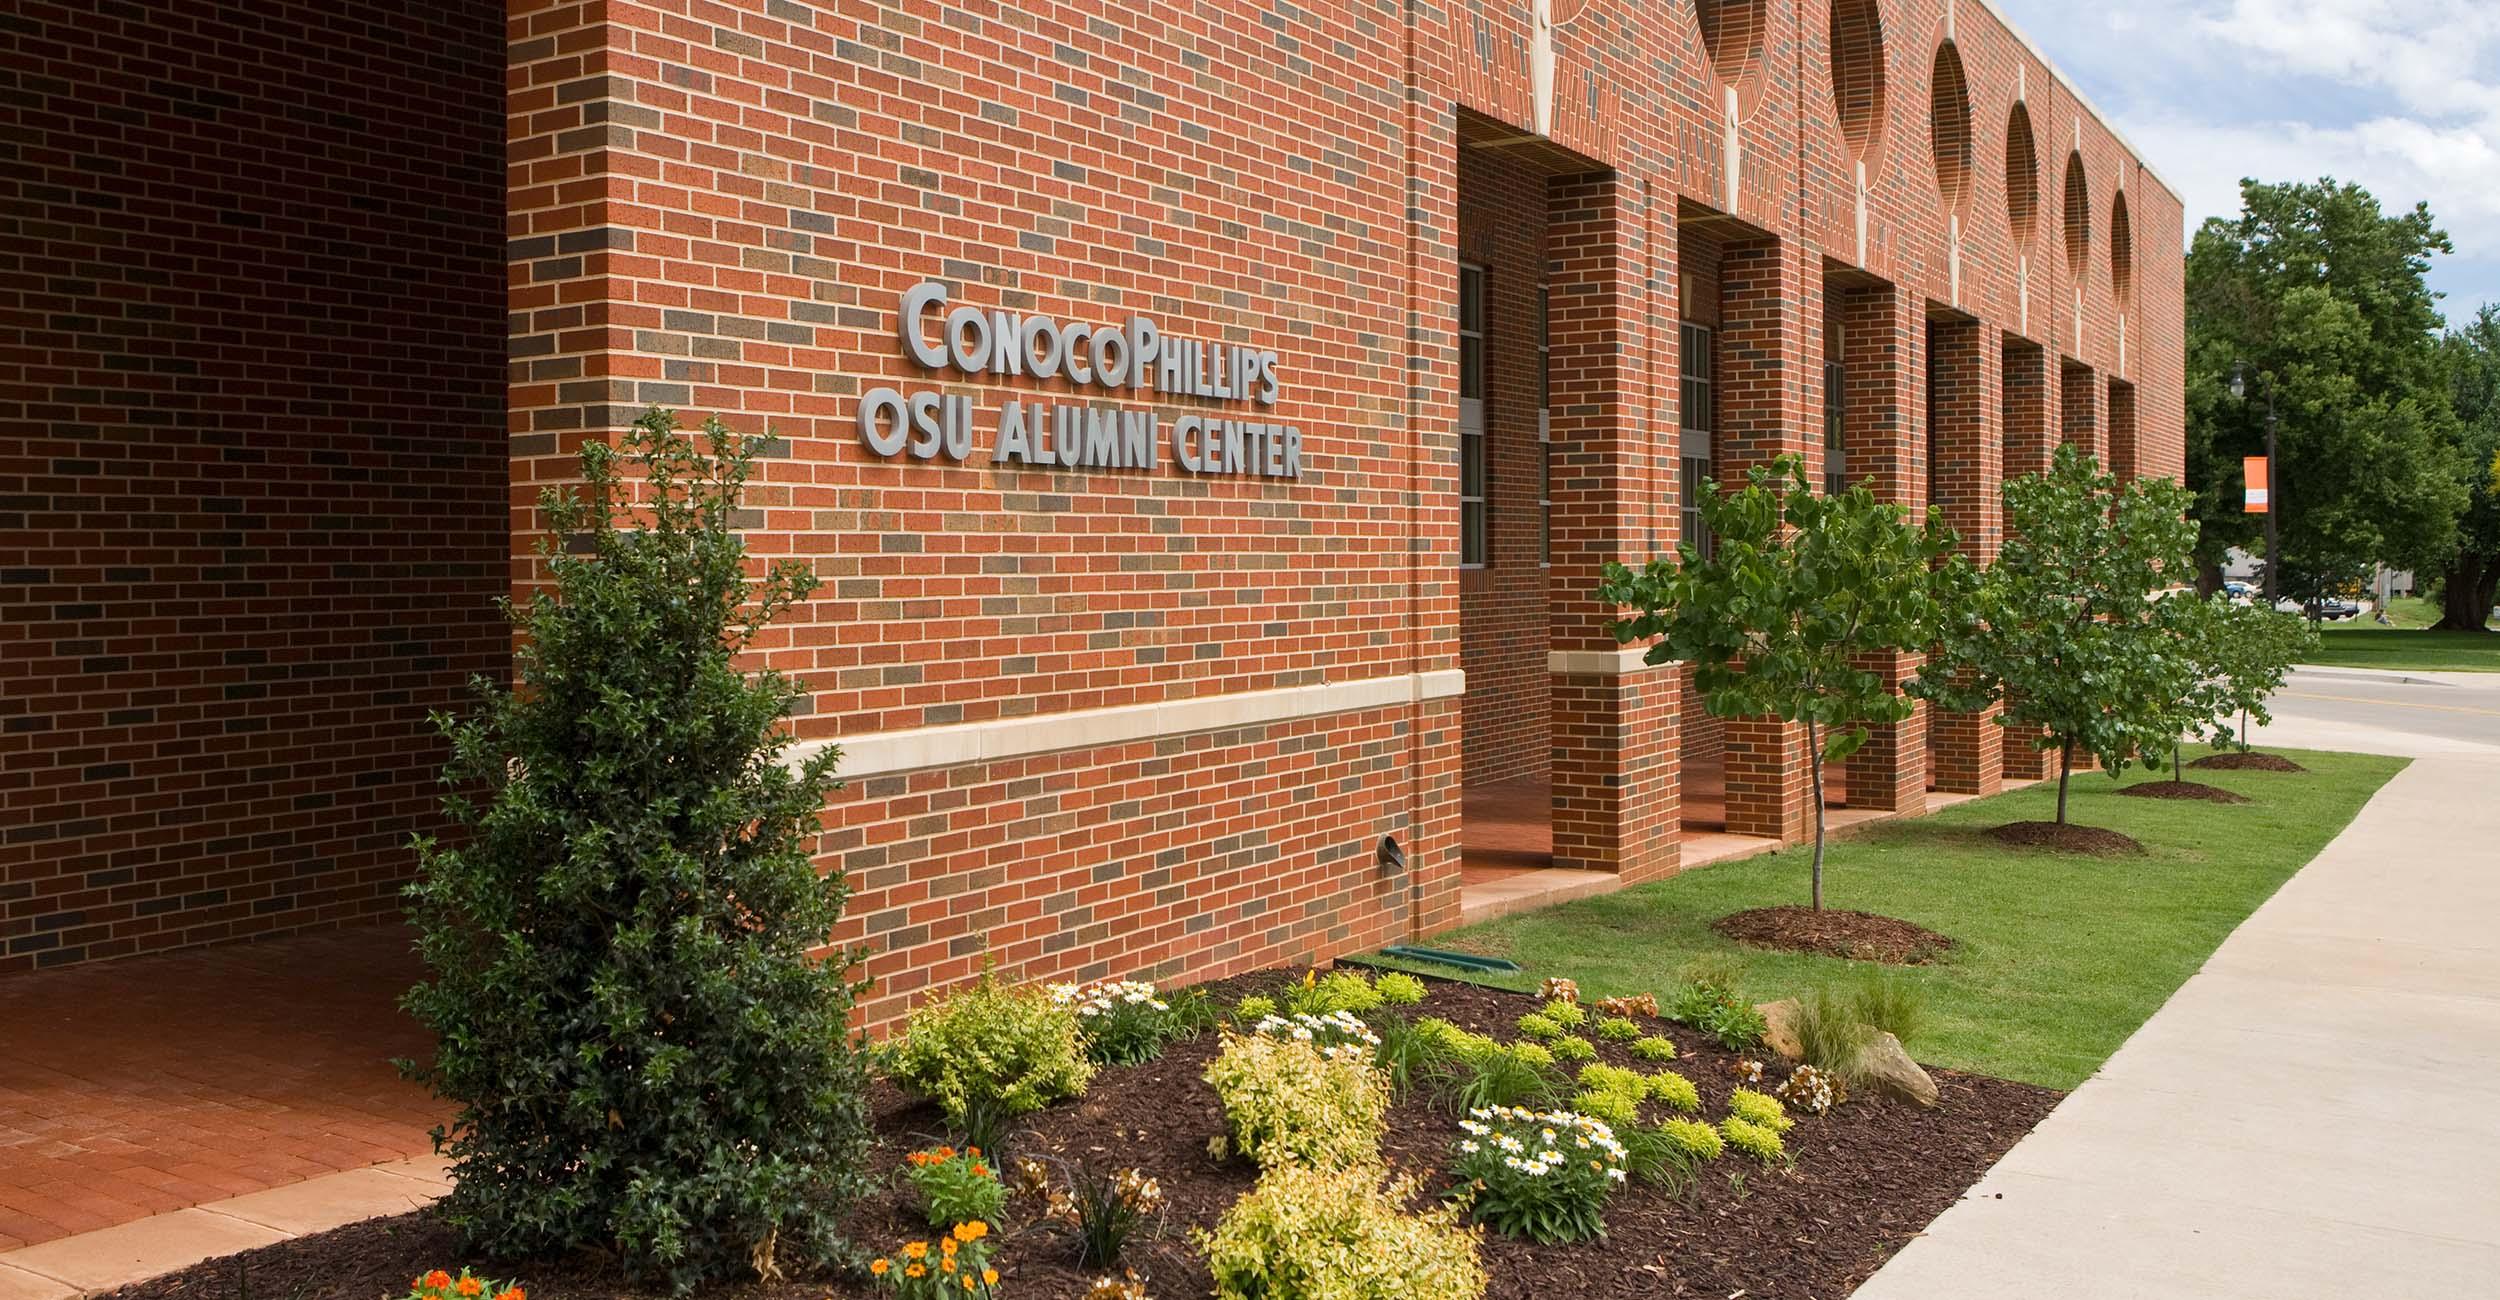 The ConocoPhillips OSU Alumni Center in Stillwater.